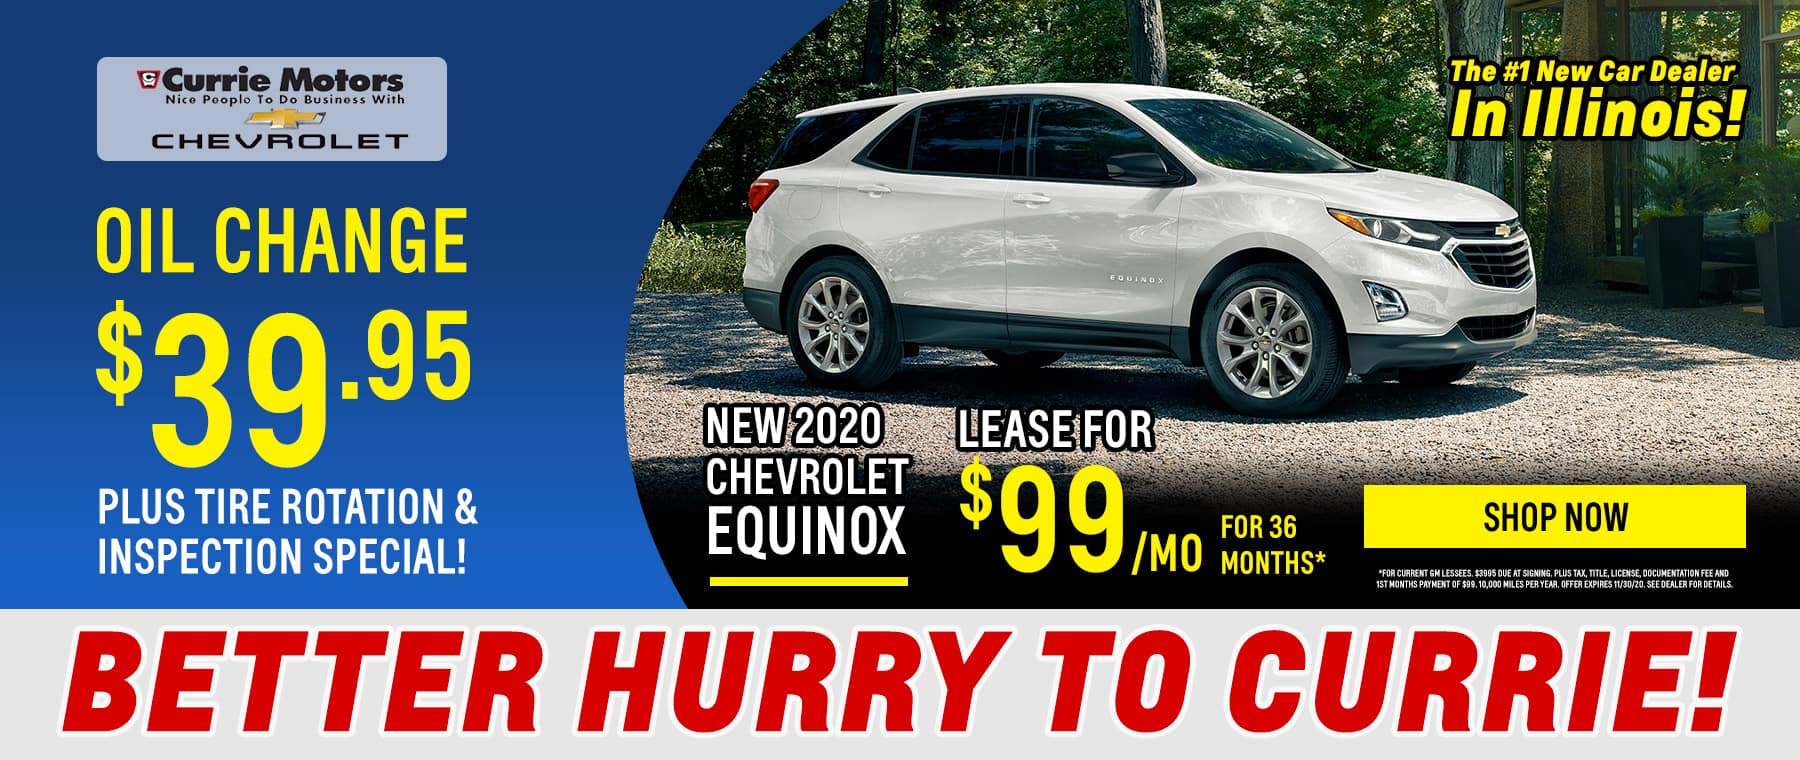 Equinox Special Offer